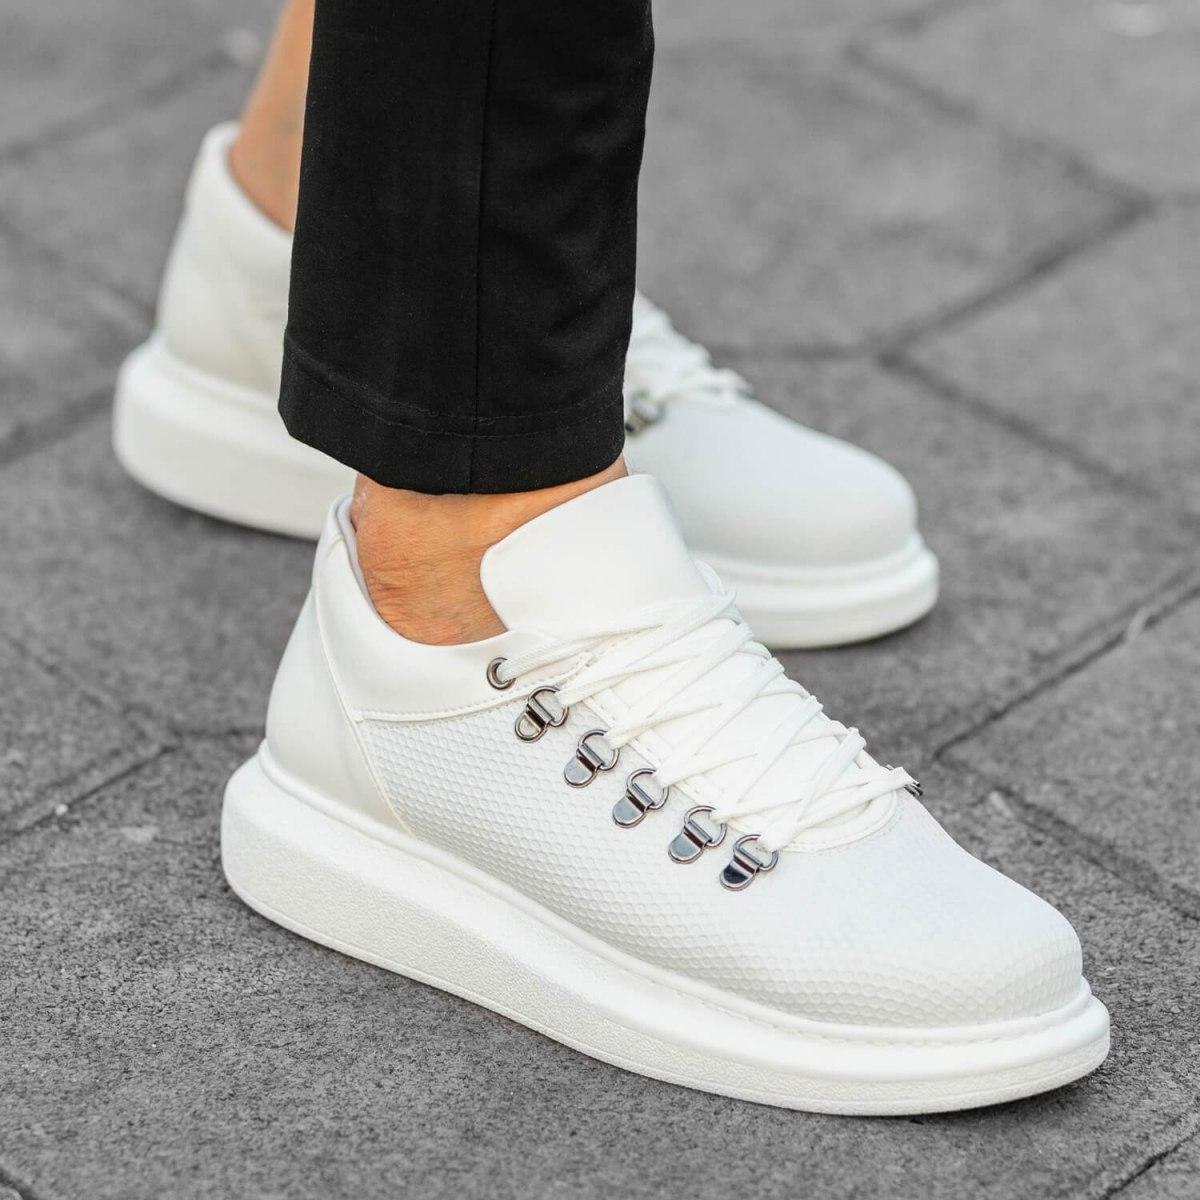 MV White Mesh Mega Sole Sneaker MV Sneaker Collection - 1